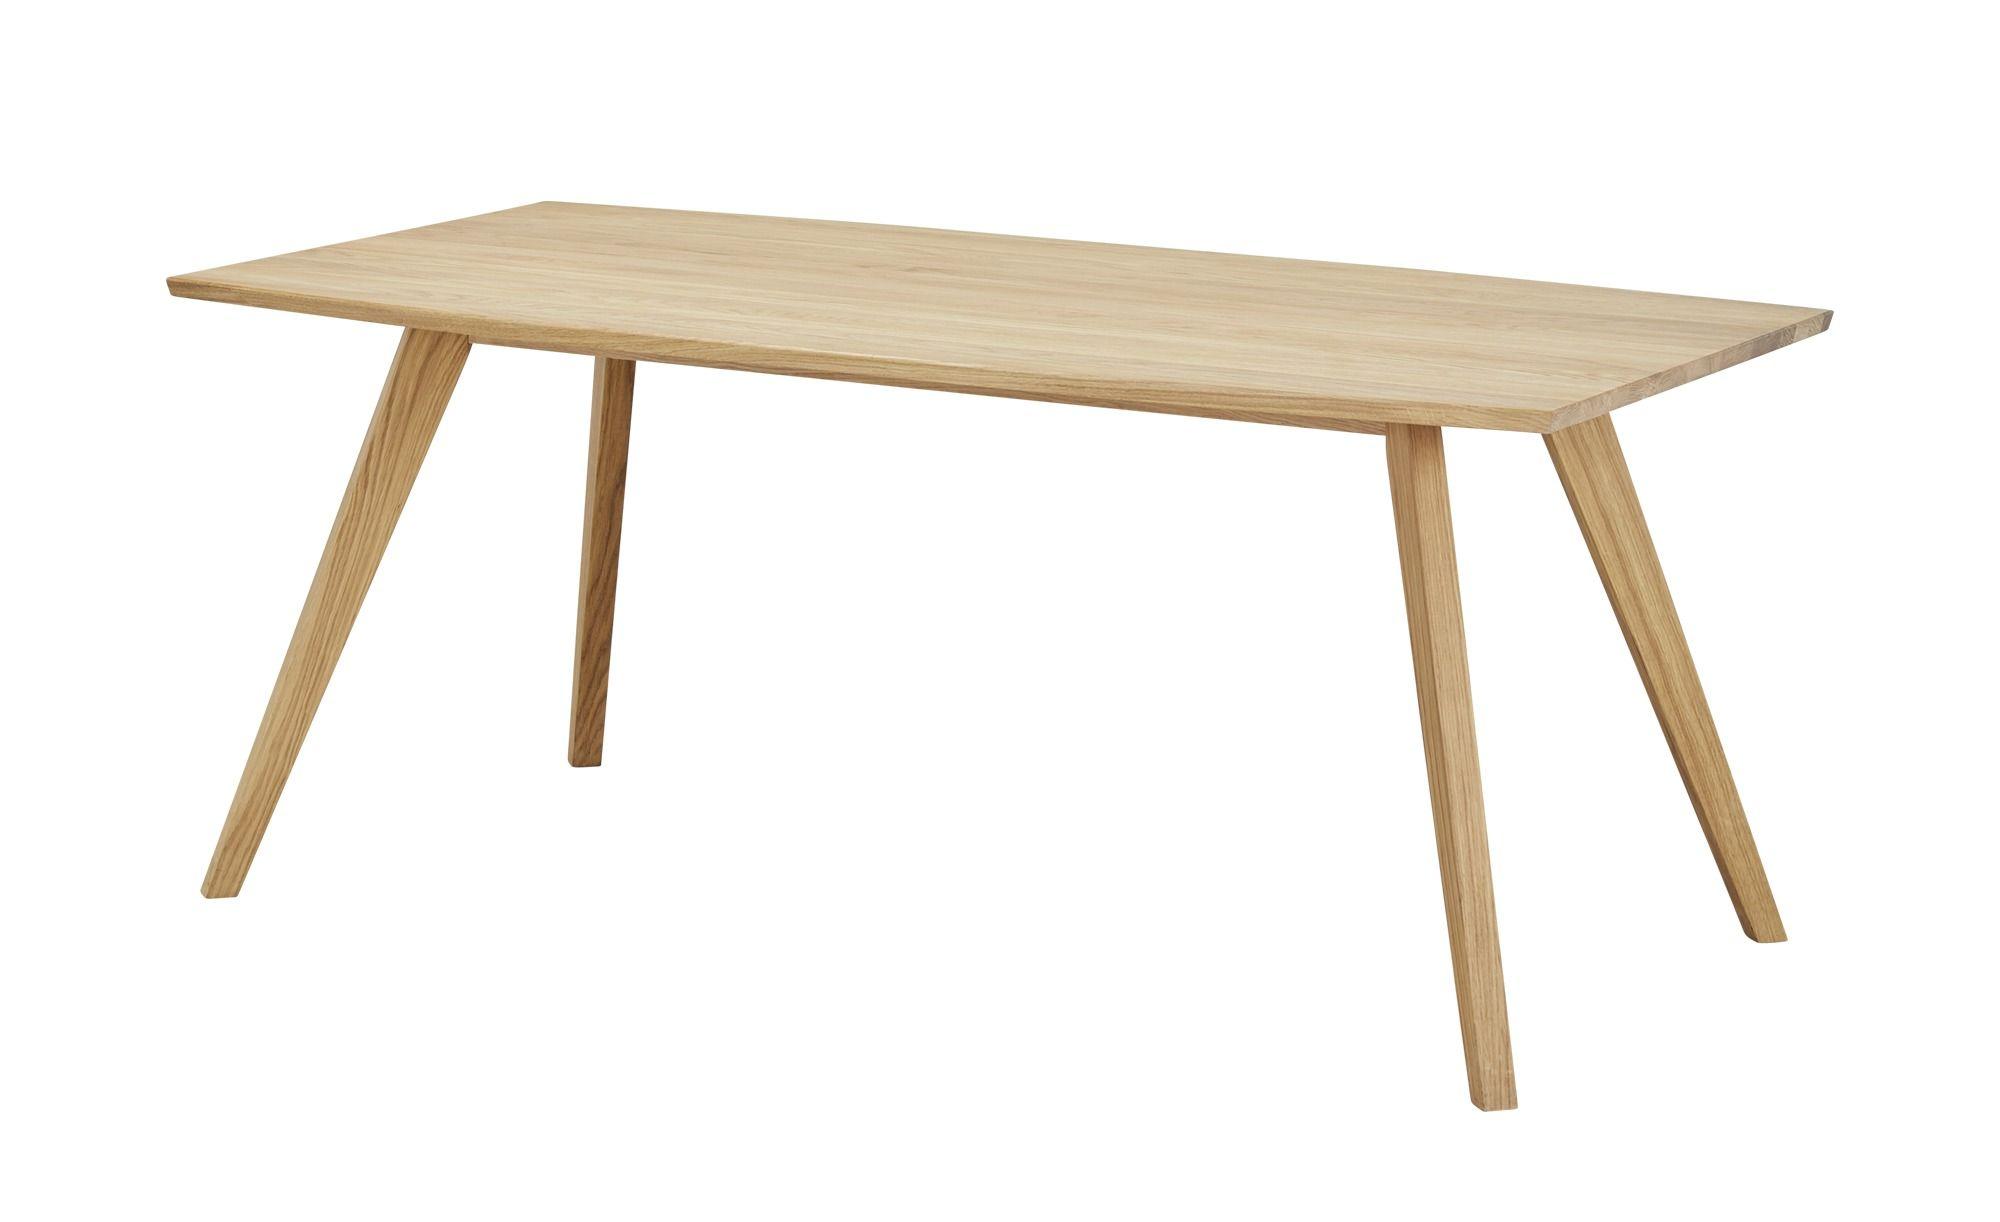 Brilliant Woodford Möbel Ideen Von Esstisch Bari Jetzt Bestellen Unter: Https://moebel.ladendirekt.de